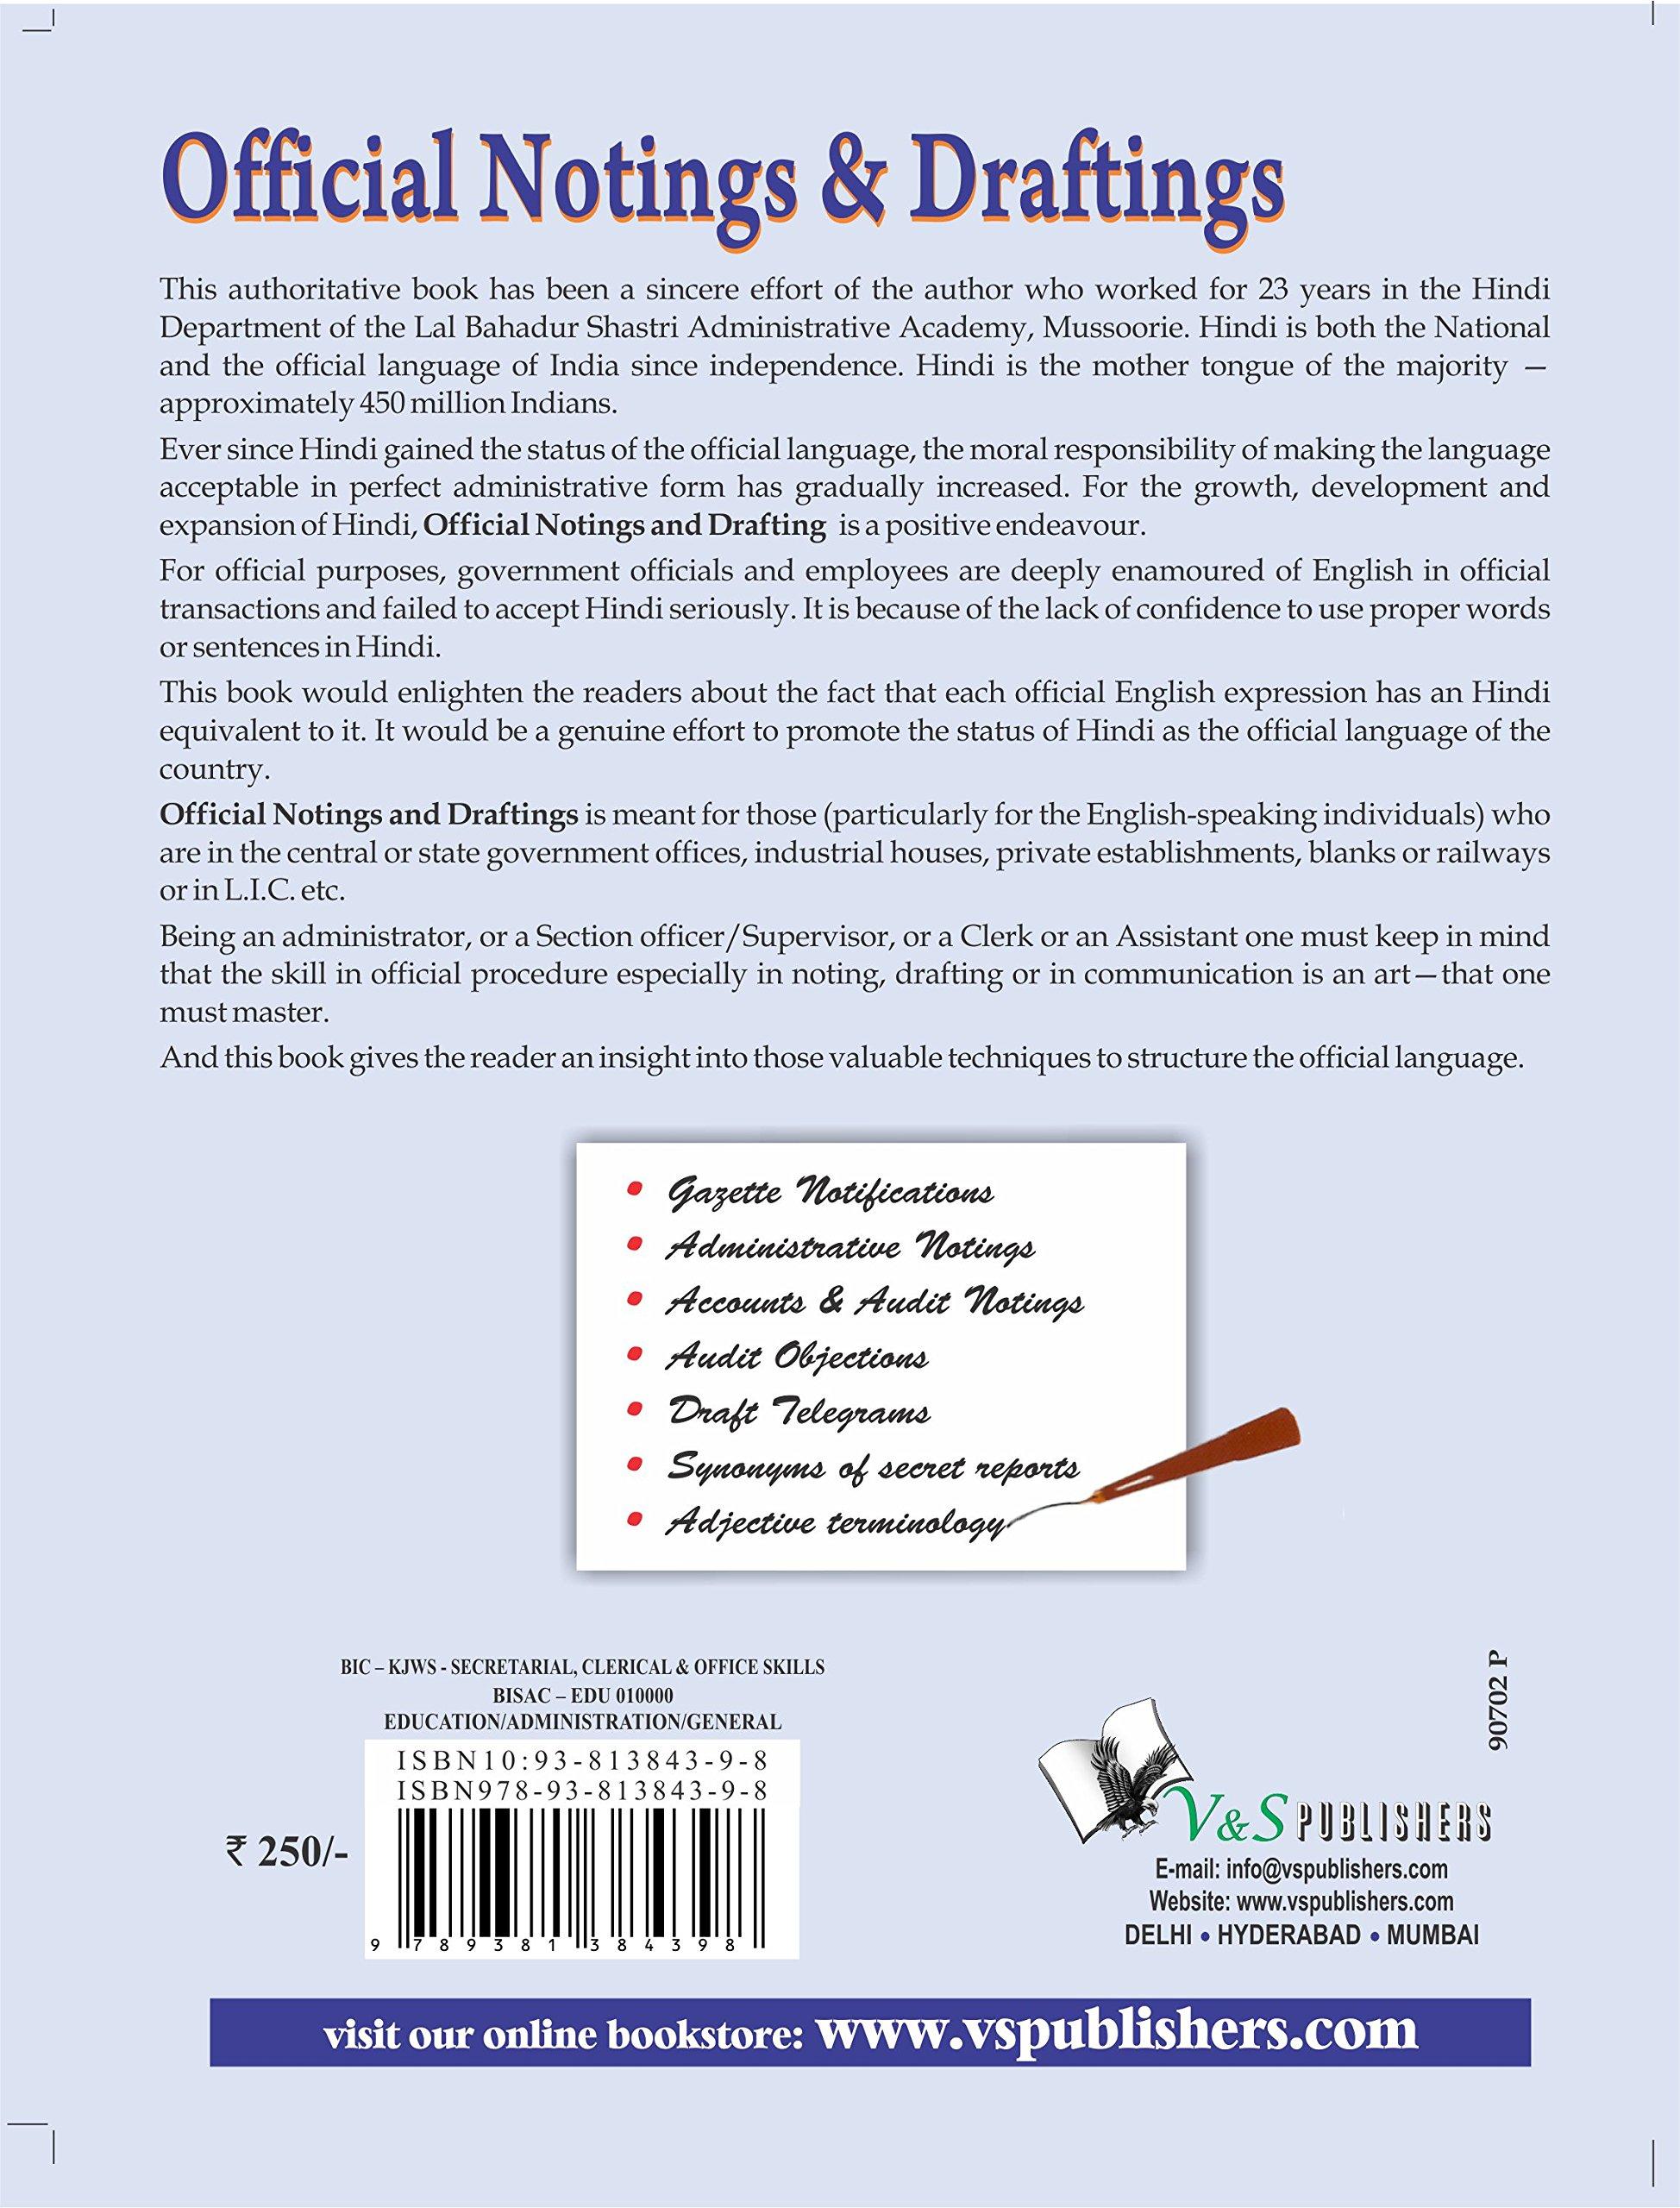 Amazon official noting drafting eng hindi 9789381384398 amazon official noting drafting eng hindi 9789381384398 chaturvedi dr shivnarayan books fandeluxe Images